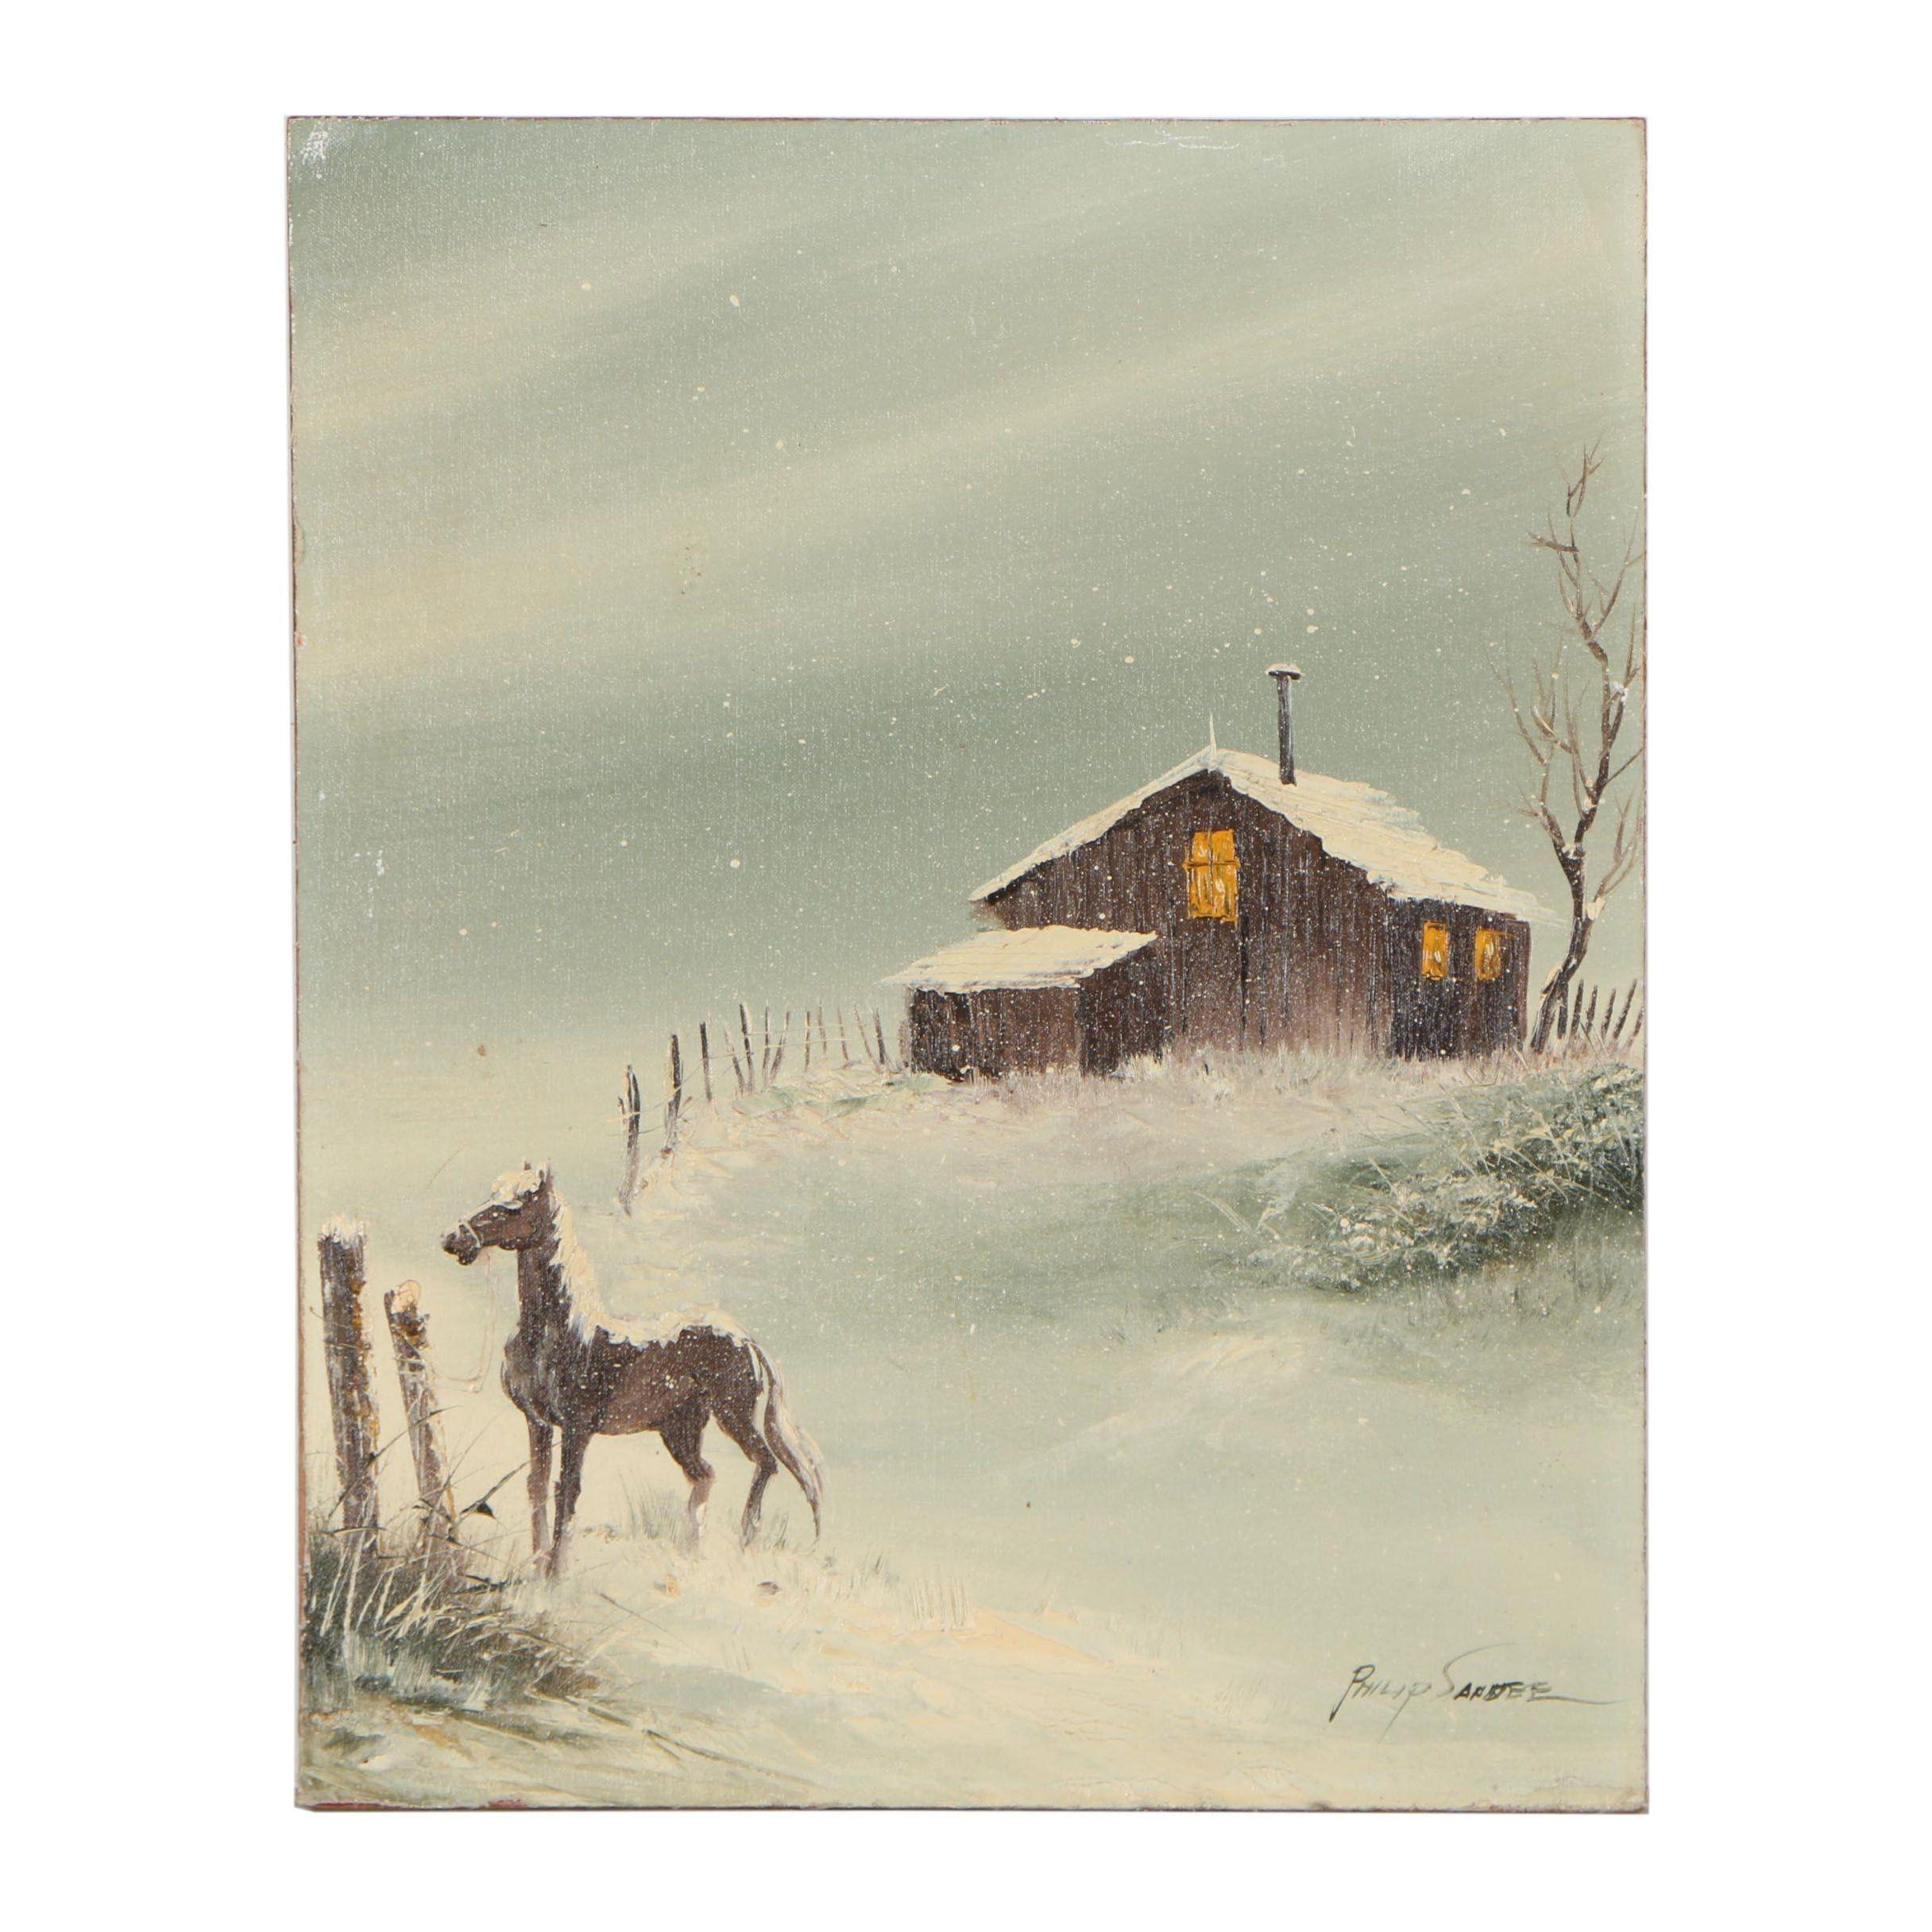 Philip Sandee Landscape Oil Painting